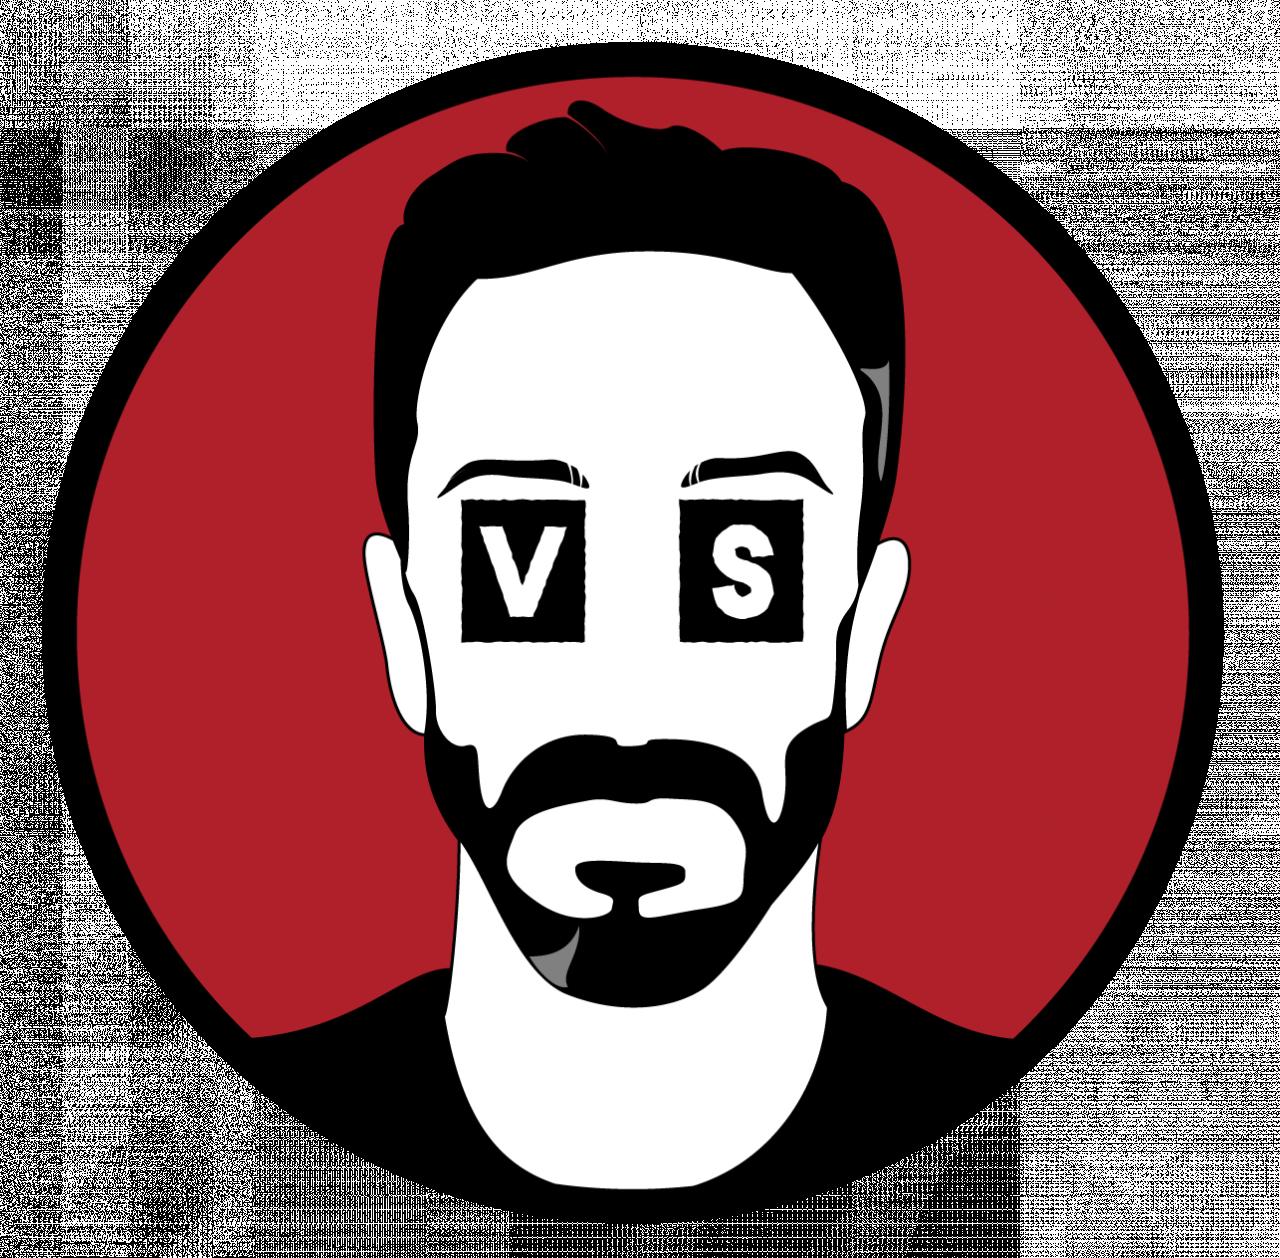 vs-red